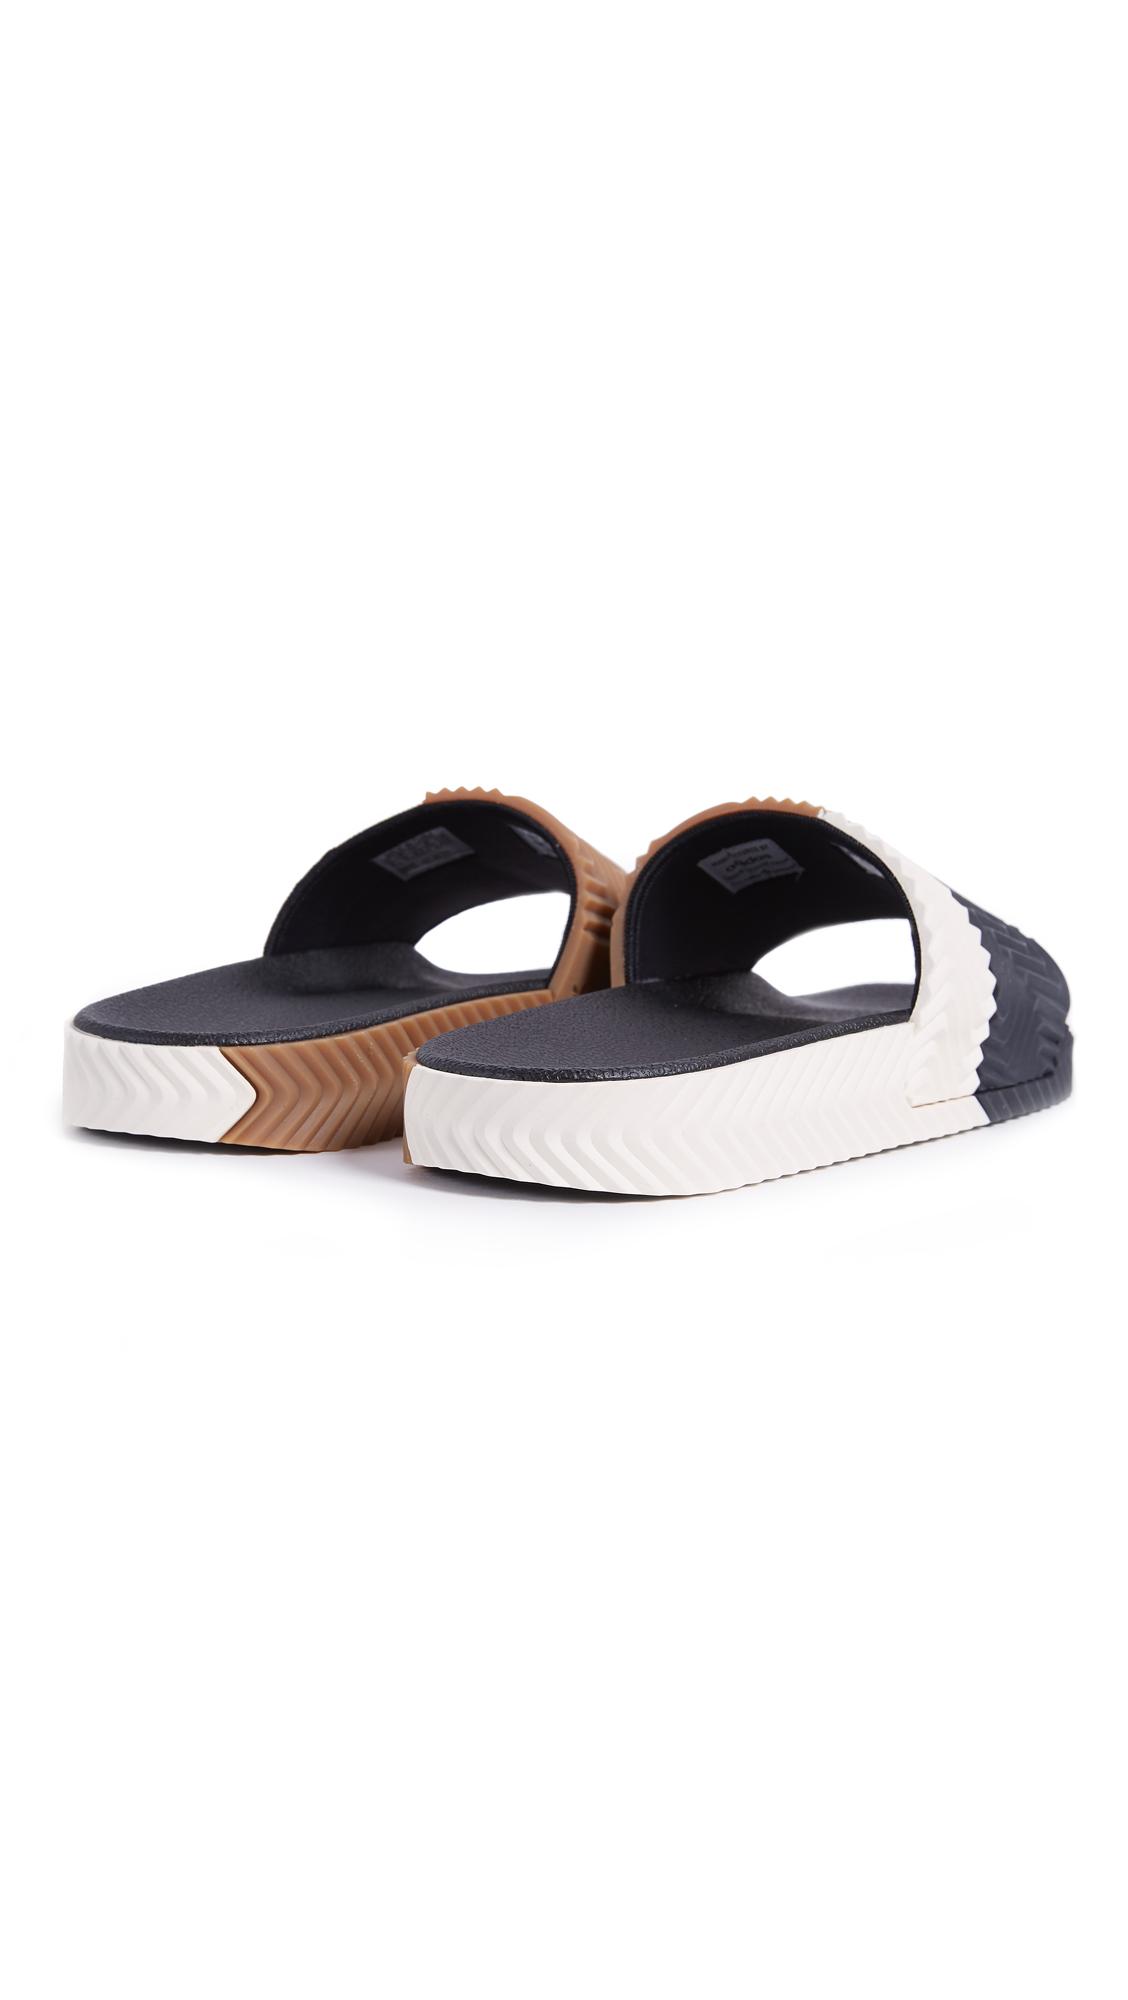 7c9bdf2264bc5 adidas Originals by Alexander Wang AW Adilette Sandals